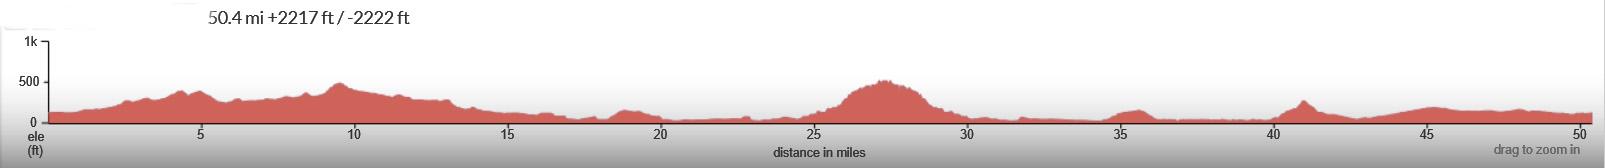 SLO-Whale-Rock-Turri-Elevation-Profile